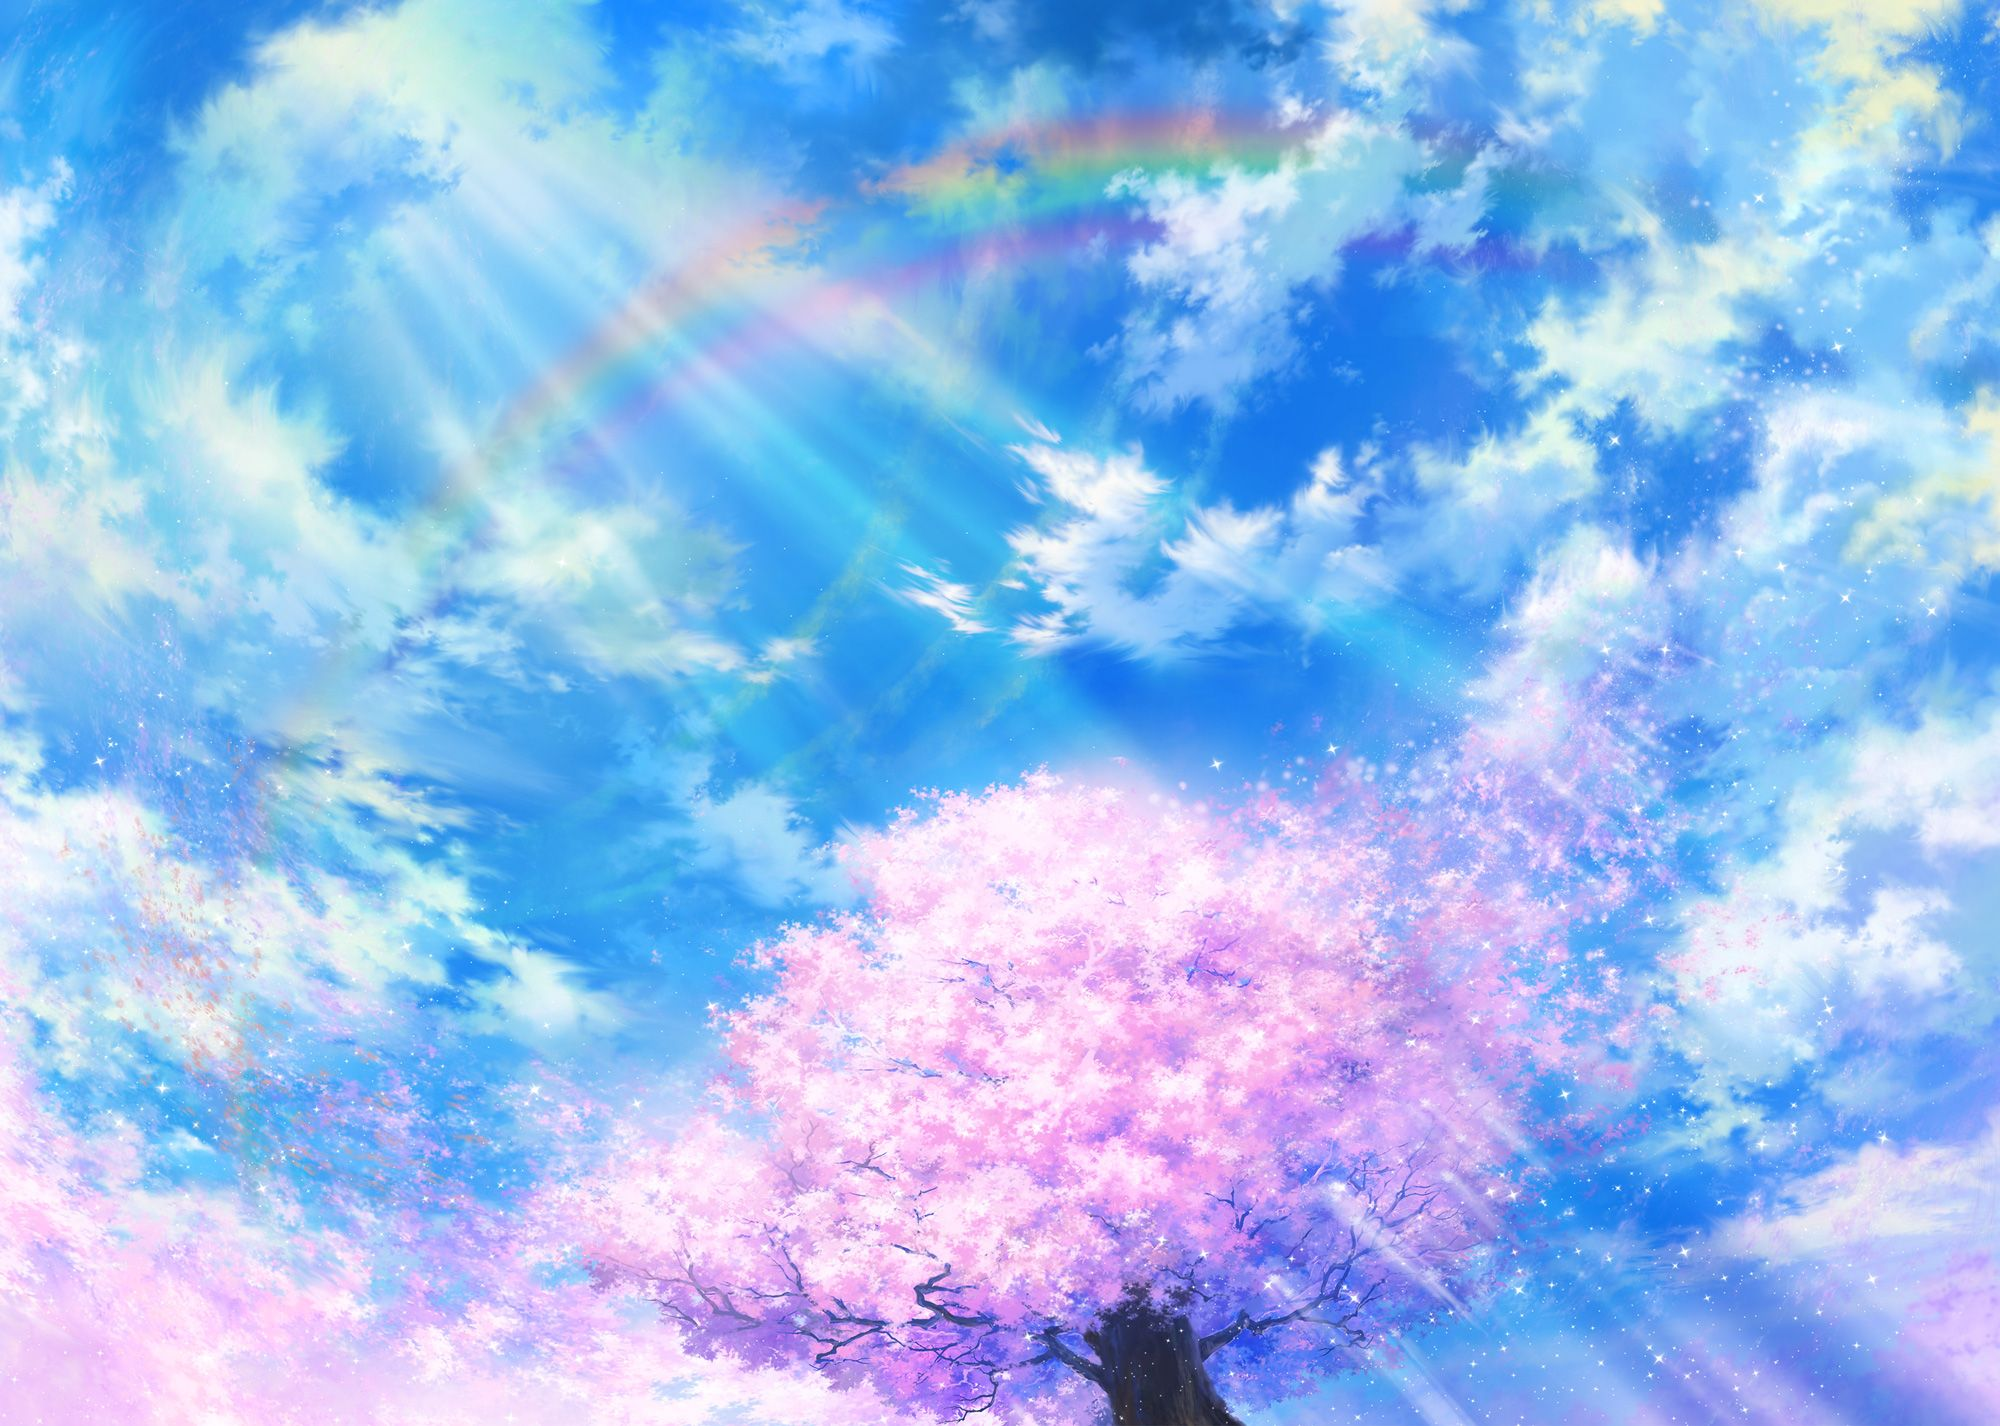 Tags Original, Pixiv, Iy Tujiki Anime Pinterest